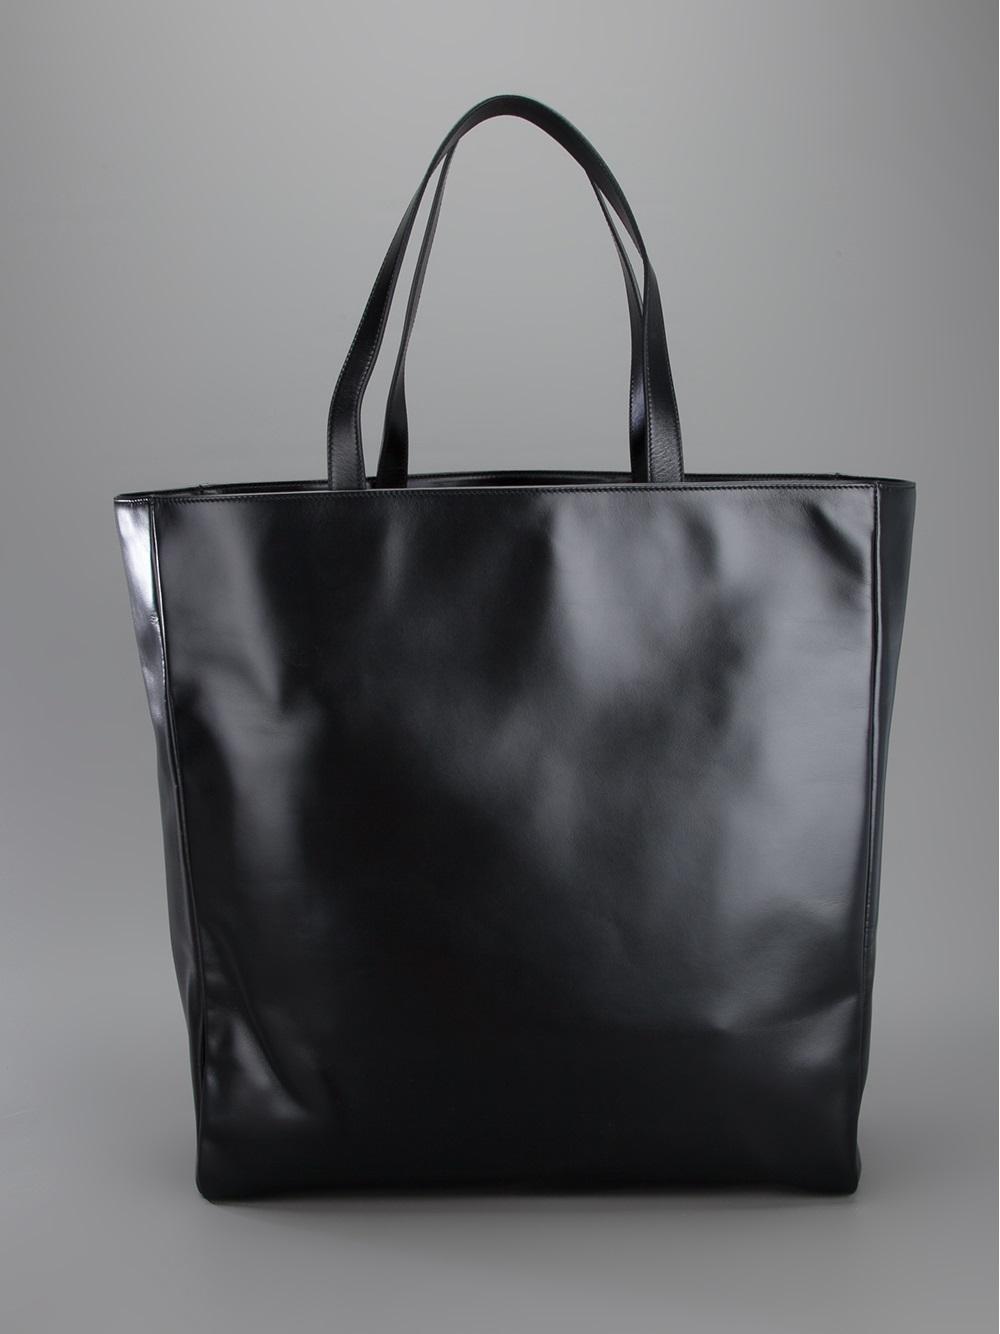 lyst saint laurent classic shopper tote in black for men. Black Bedroom Furniture Sets. Home Design Ideas